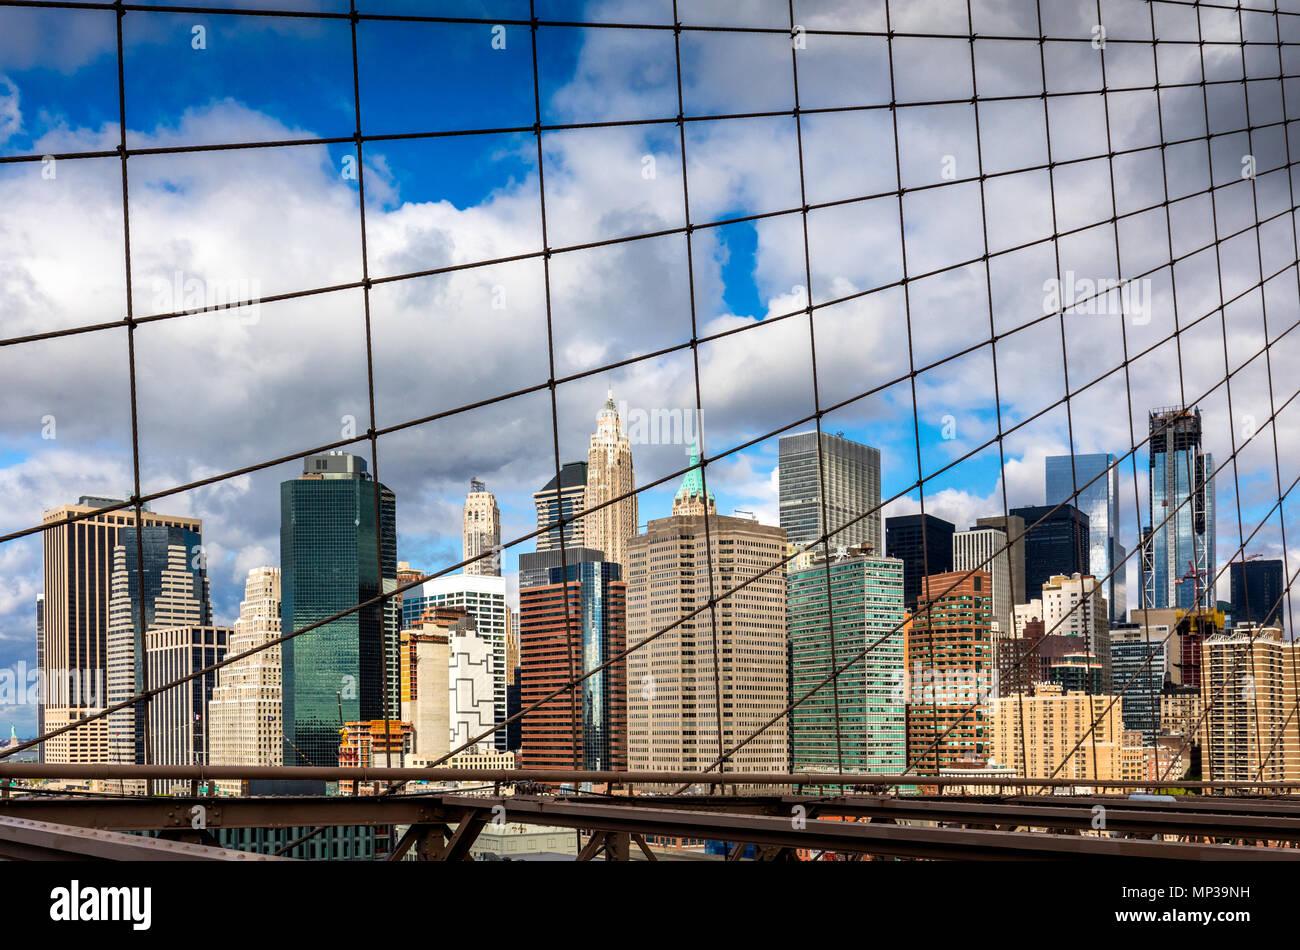 The Manhattan skyline as seen through the mesh of the Brooklyn Bridge in New York City, USA. - Stock Image